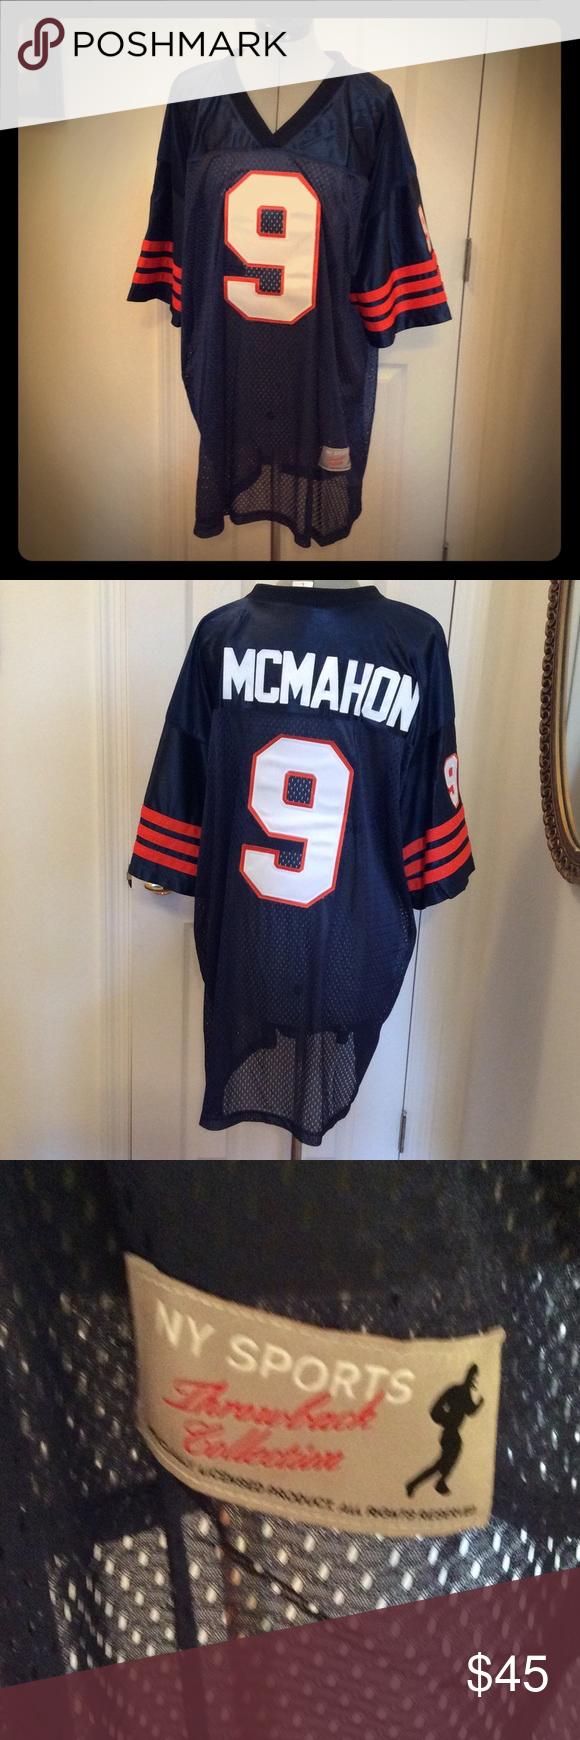 new concept 234e7 7cf73 💰SALE‼️Jim McMahon jersey Throwback collection, size men's ...